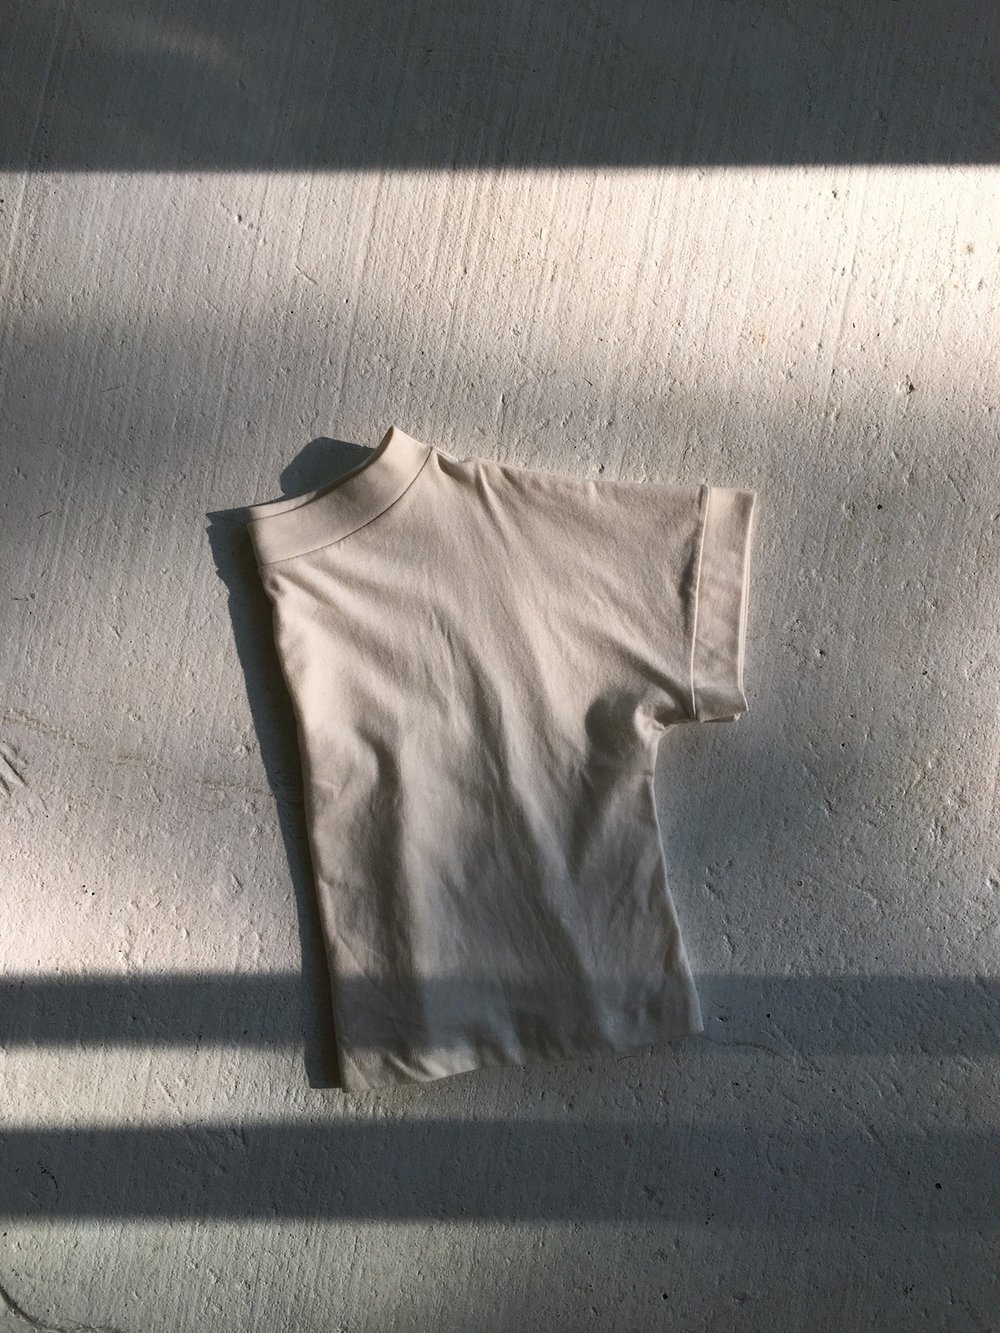 jersey top in cream